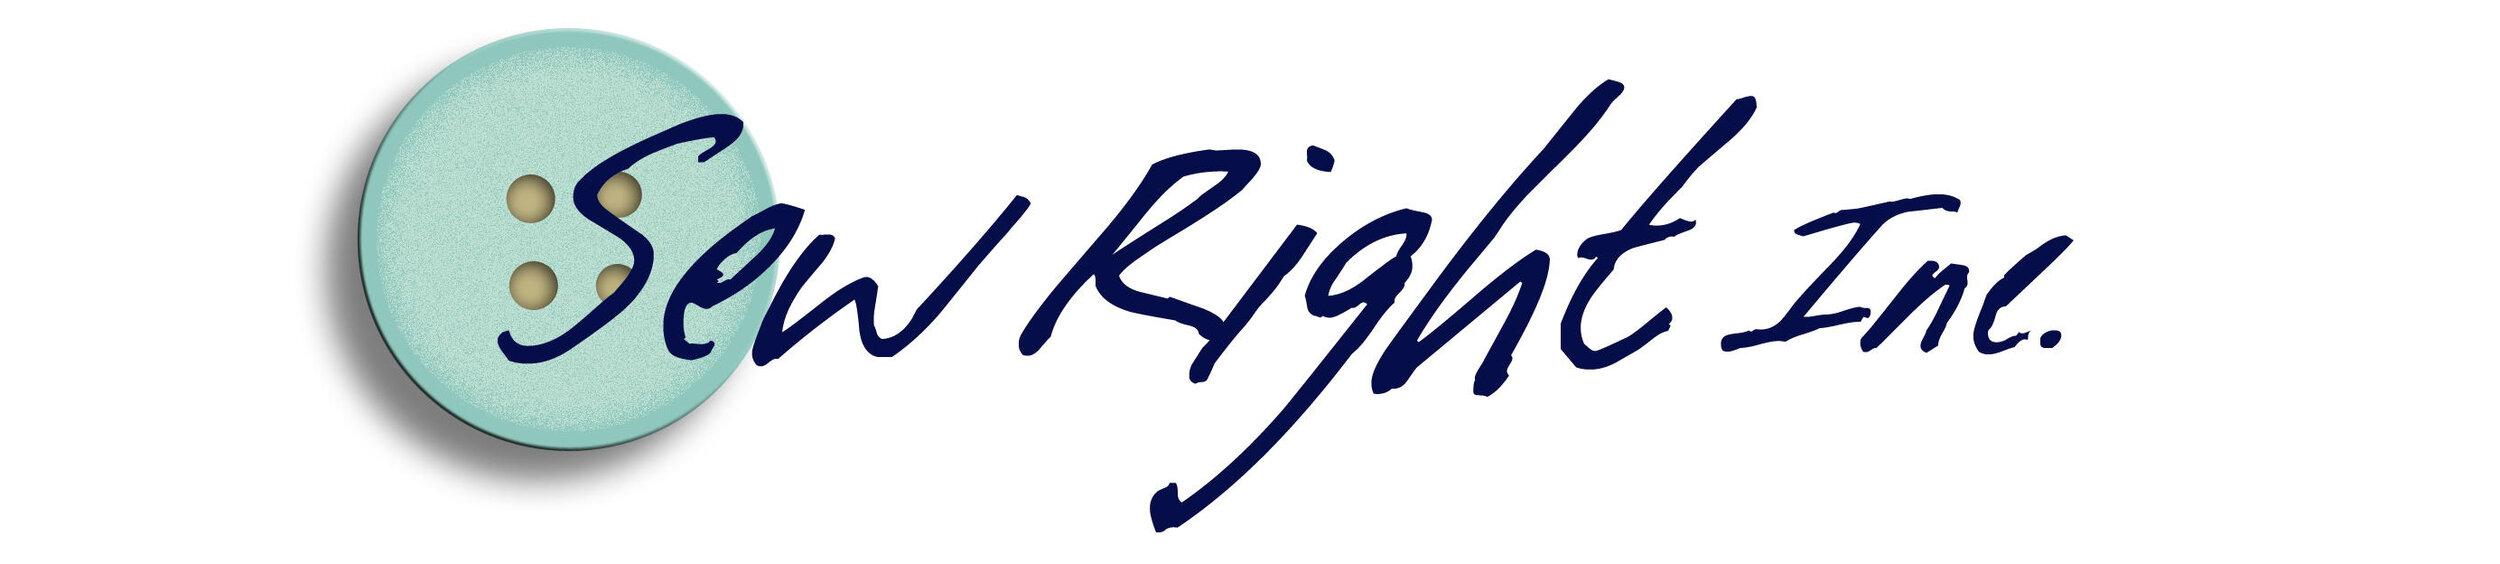 logo 11-2012.jpg